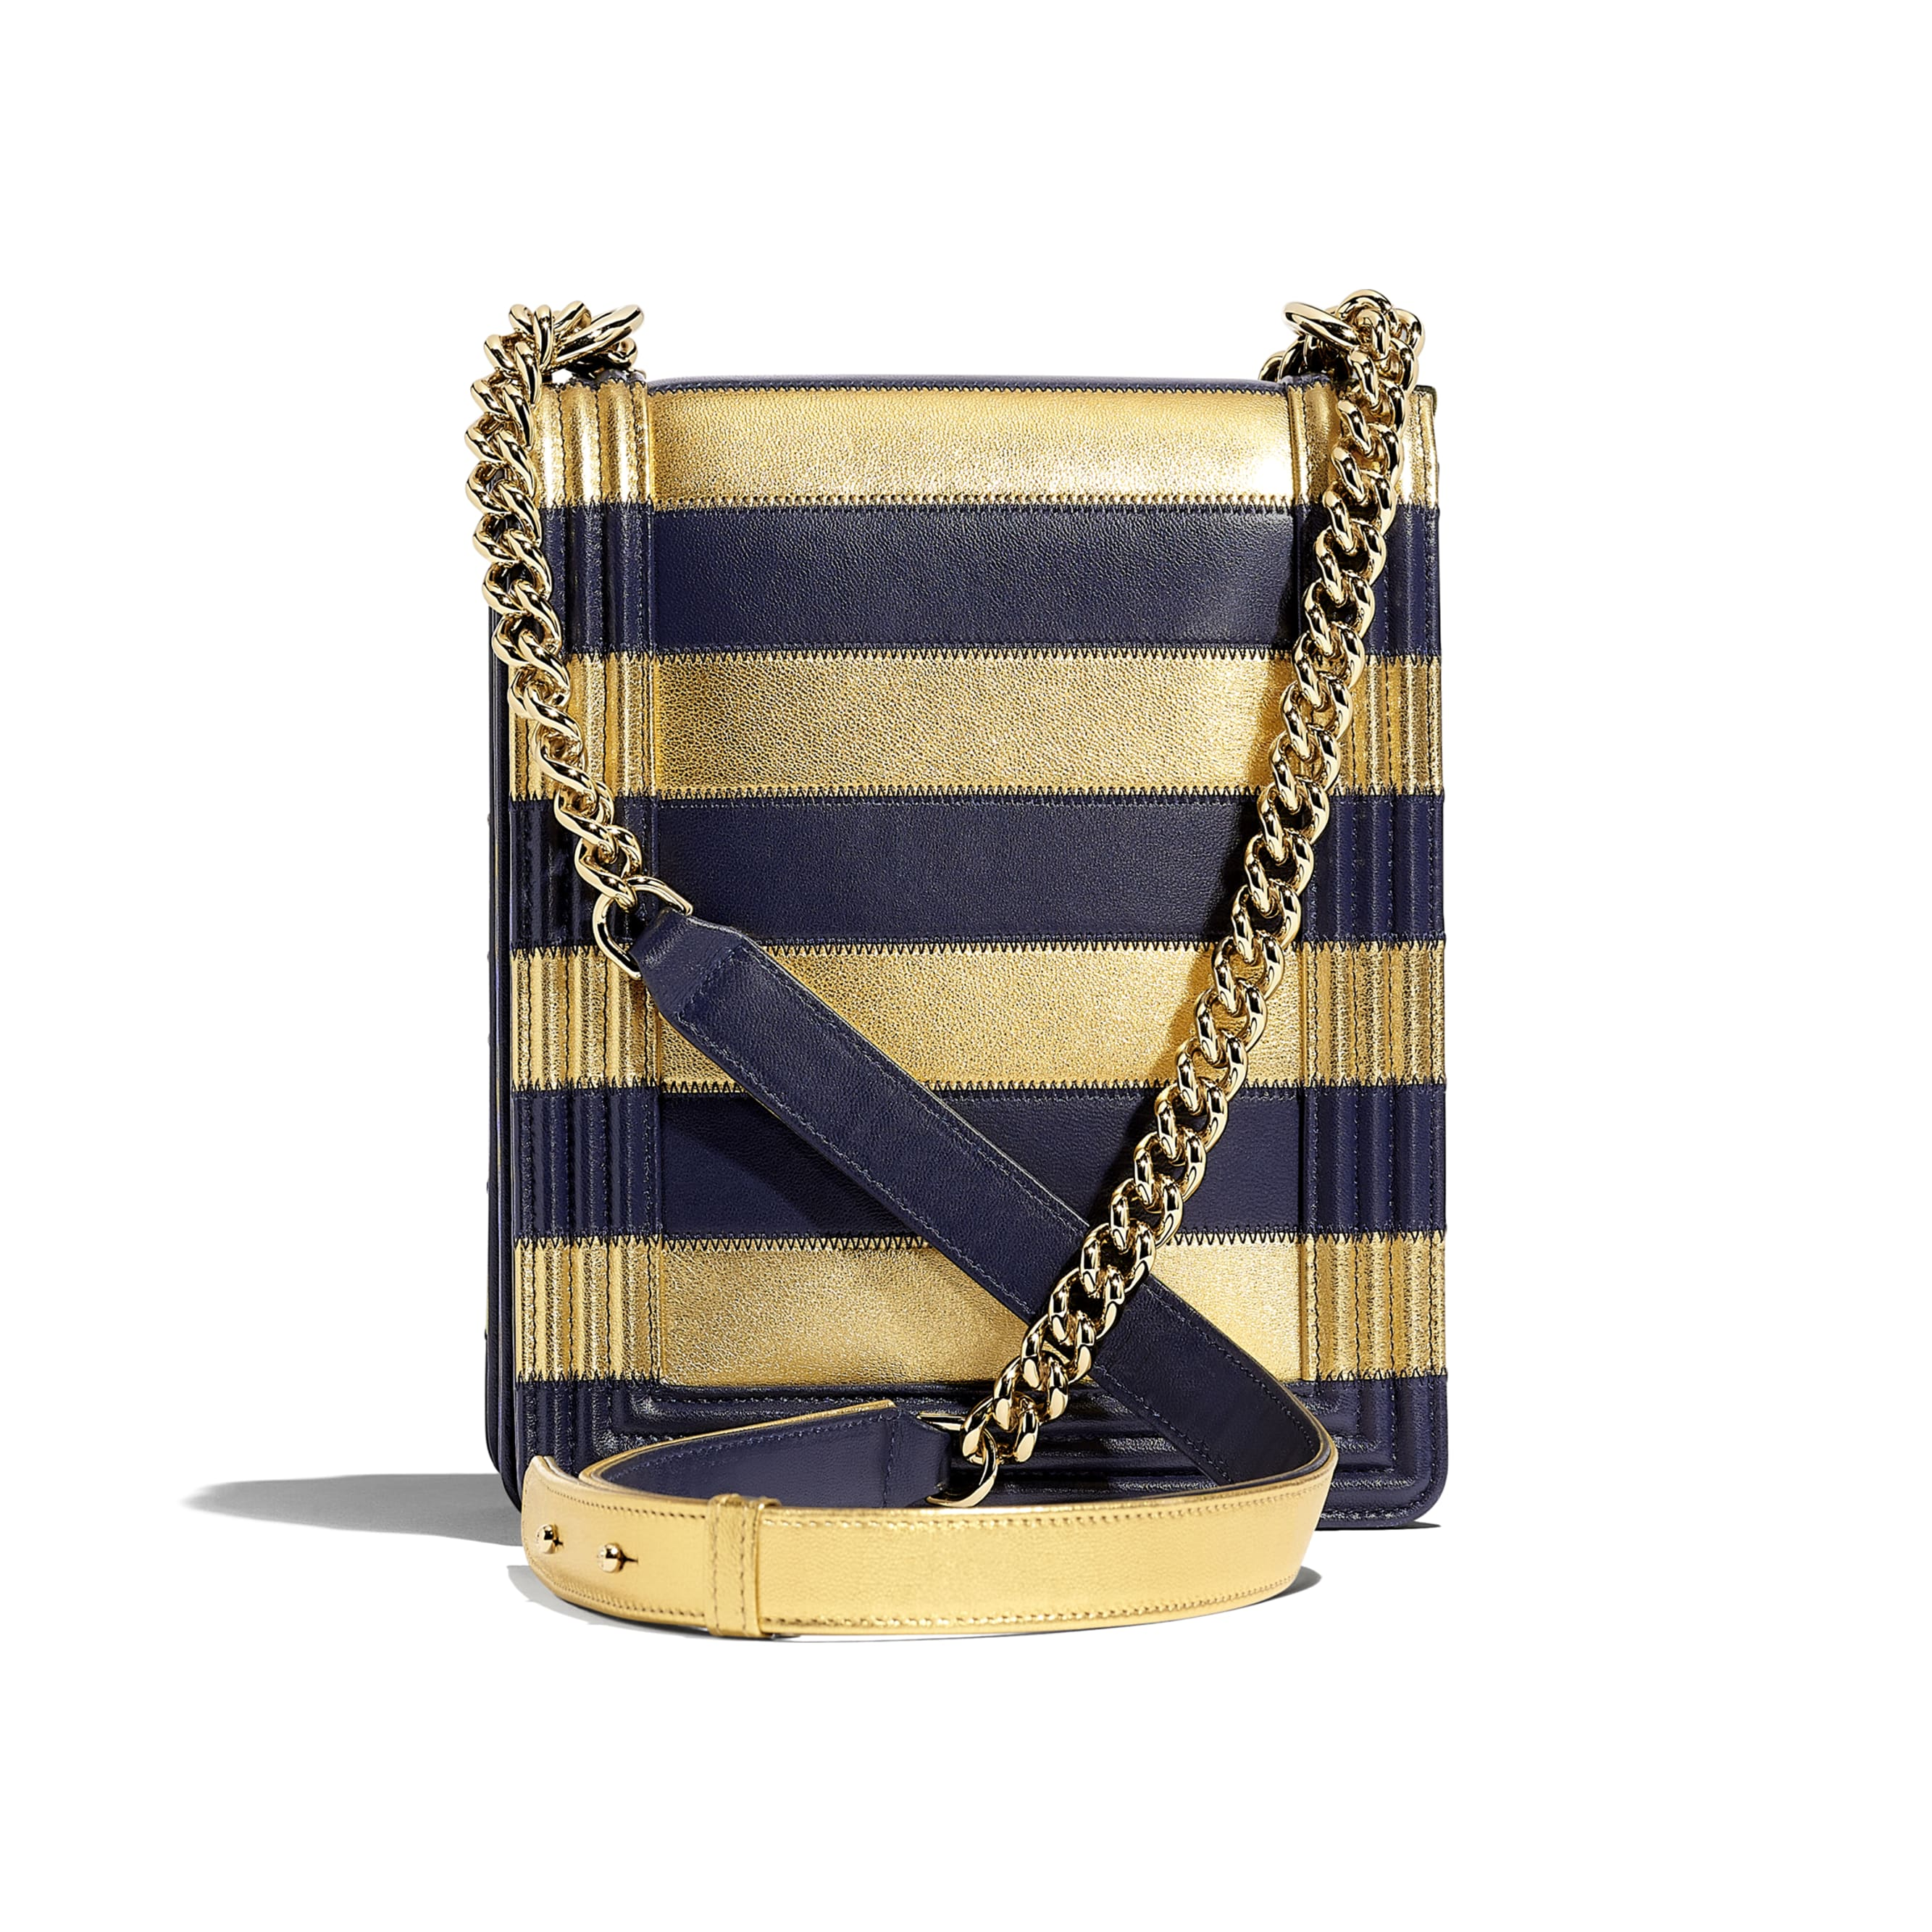 BOY CHANEL Handbag - Gold & Navy Blue - Lambskin, Calfskin & Gold-Tone Metal - Alternative view - see standard sized version